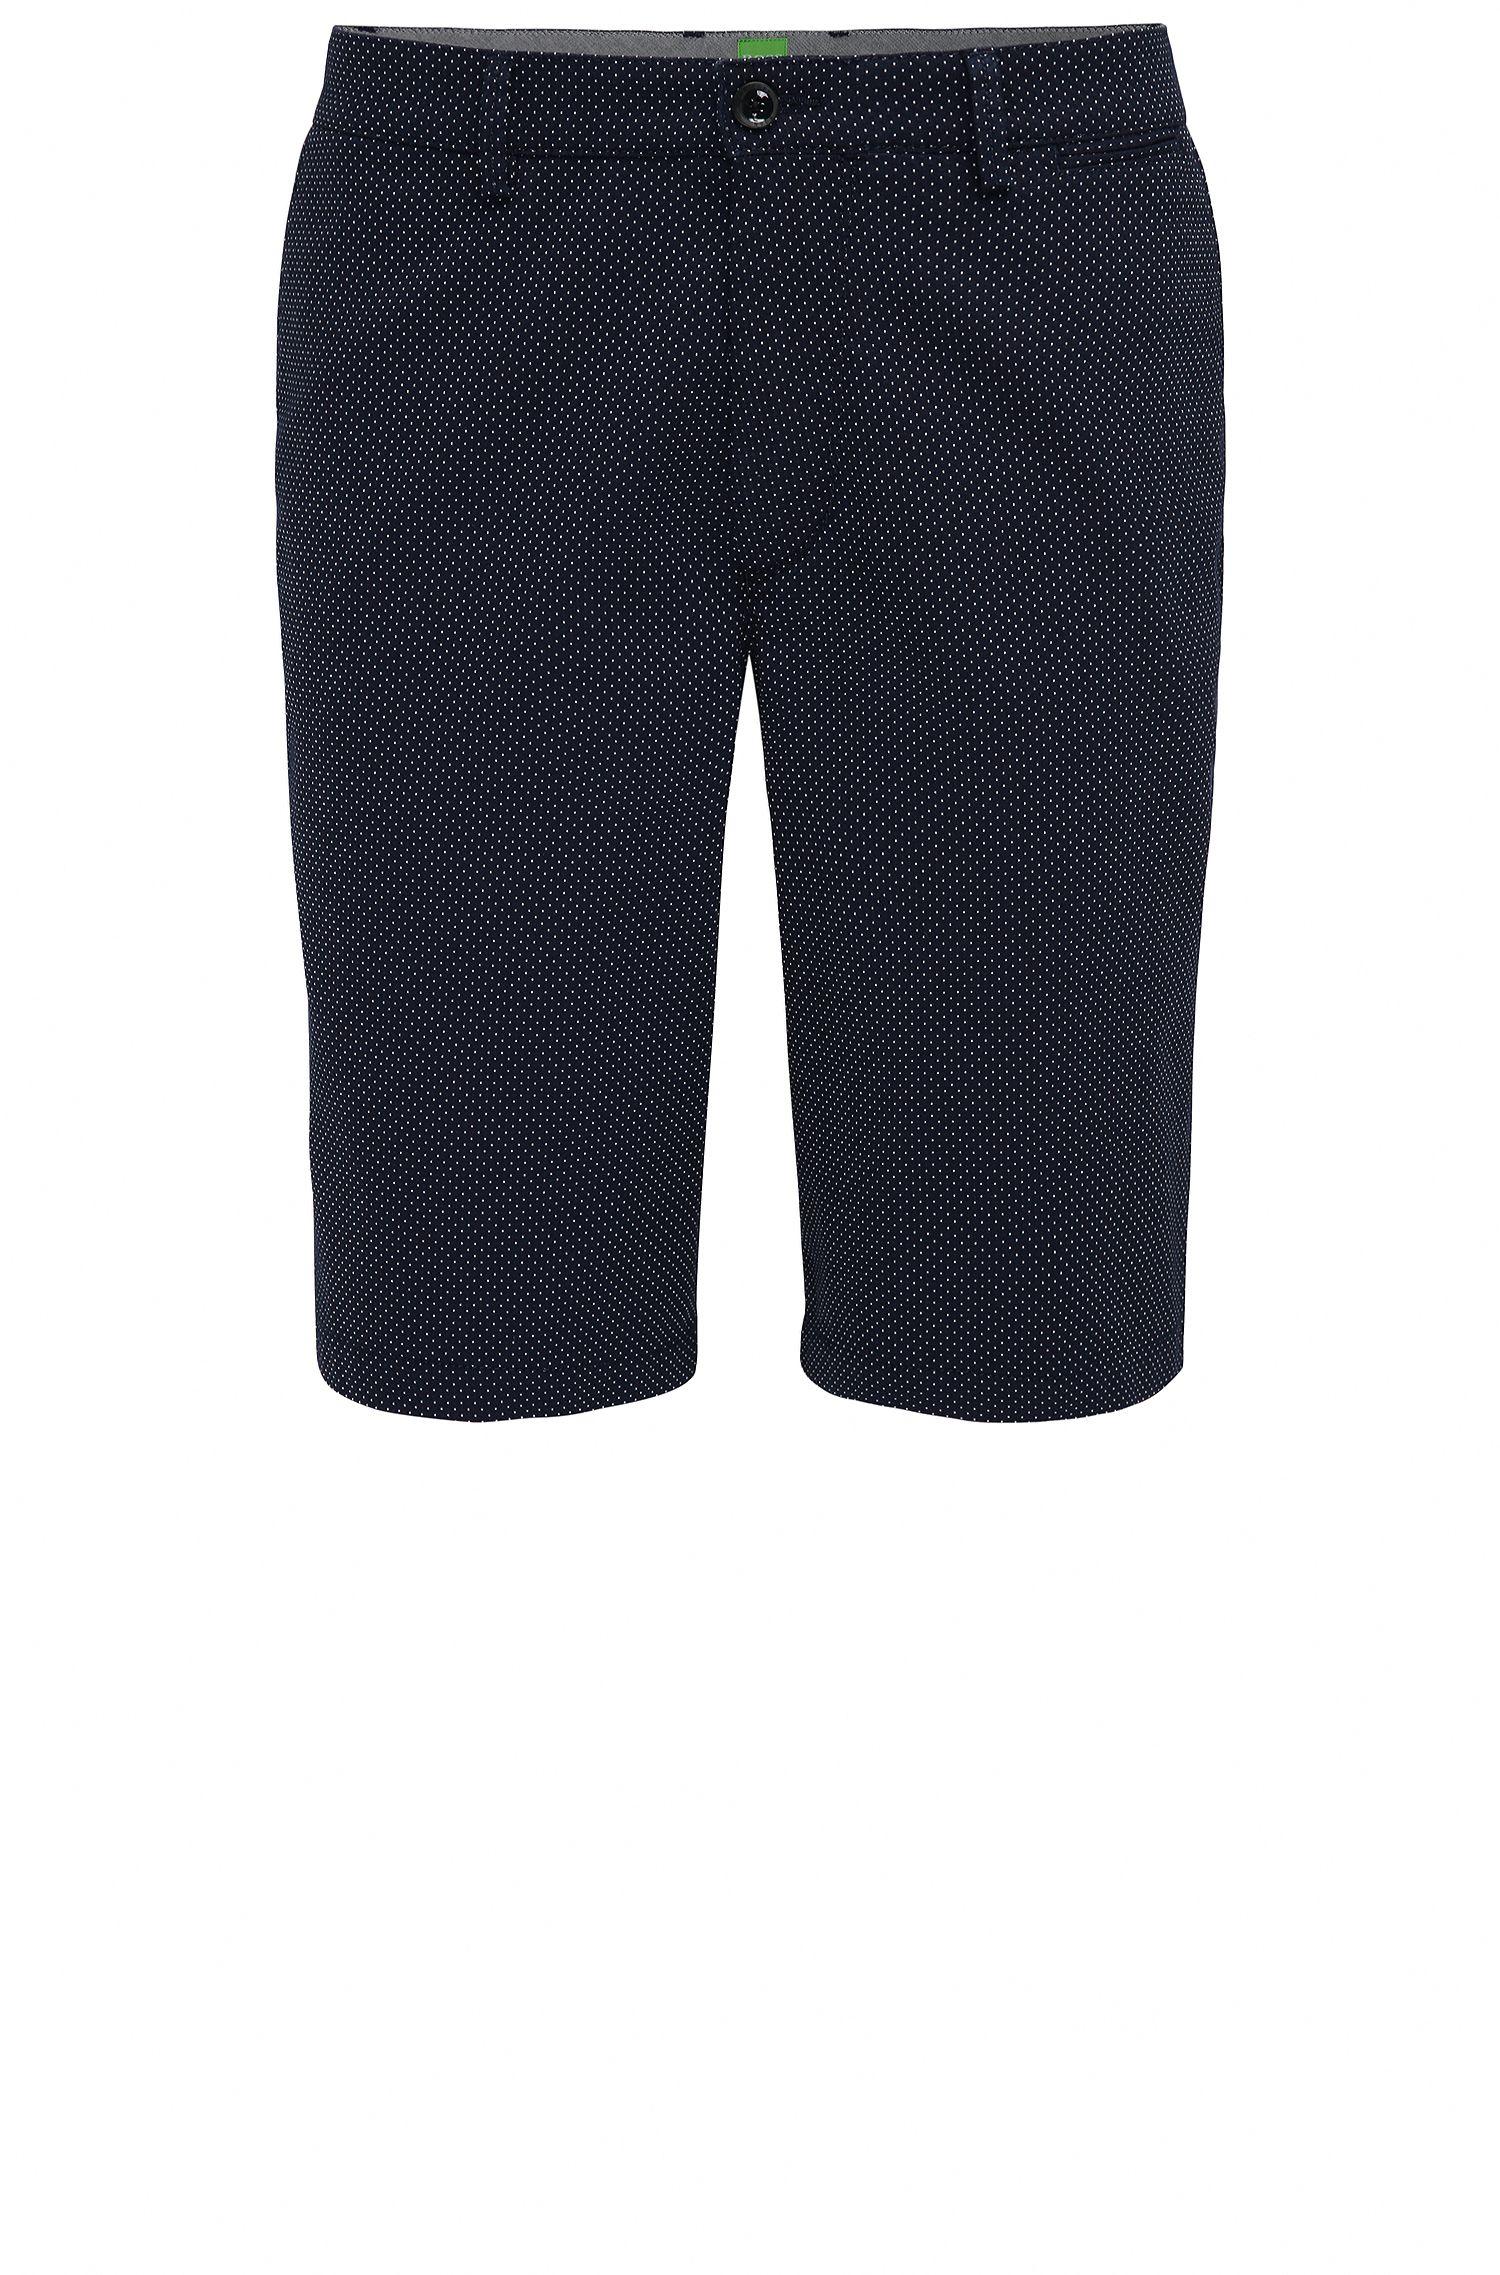 Shorts regular fit en jacquard de puntitos